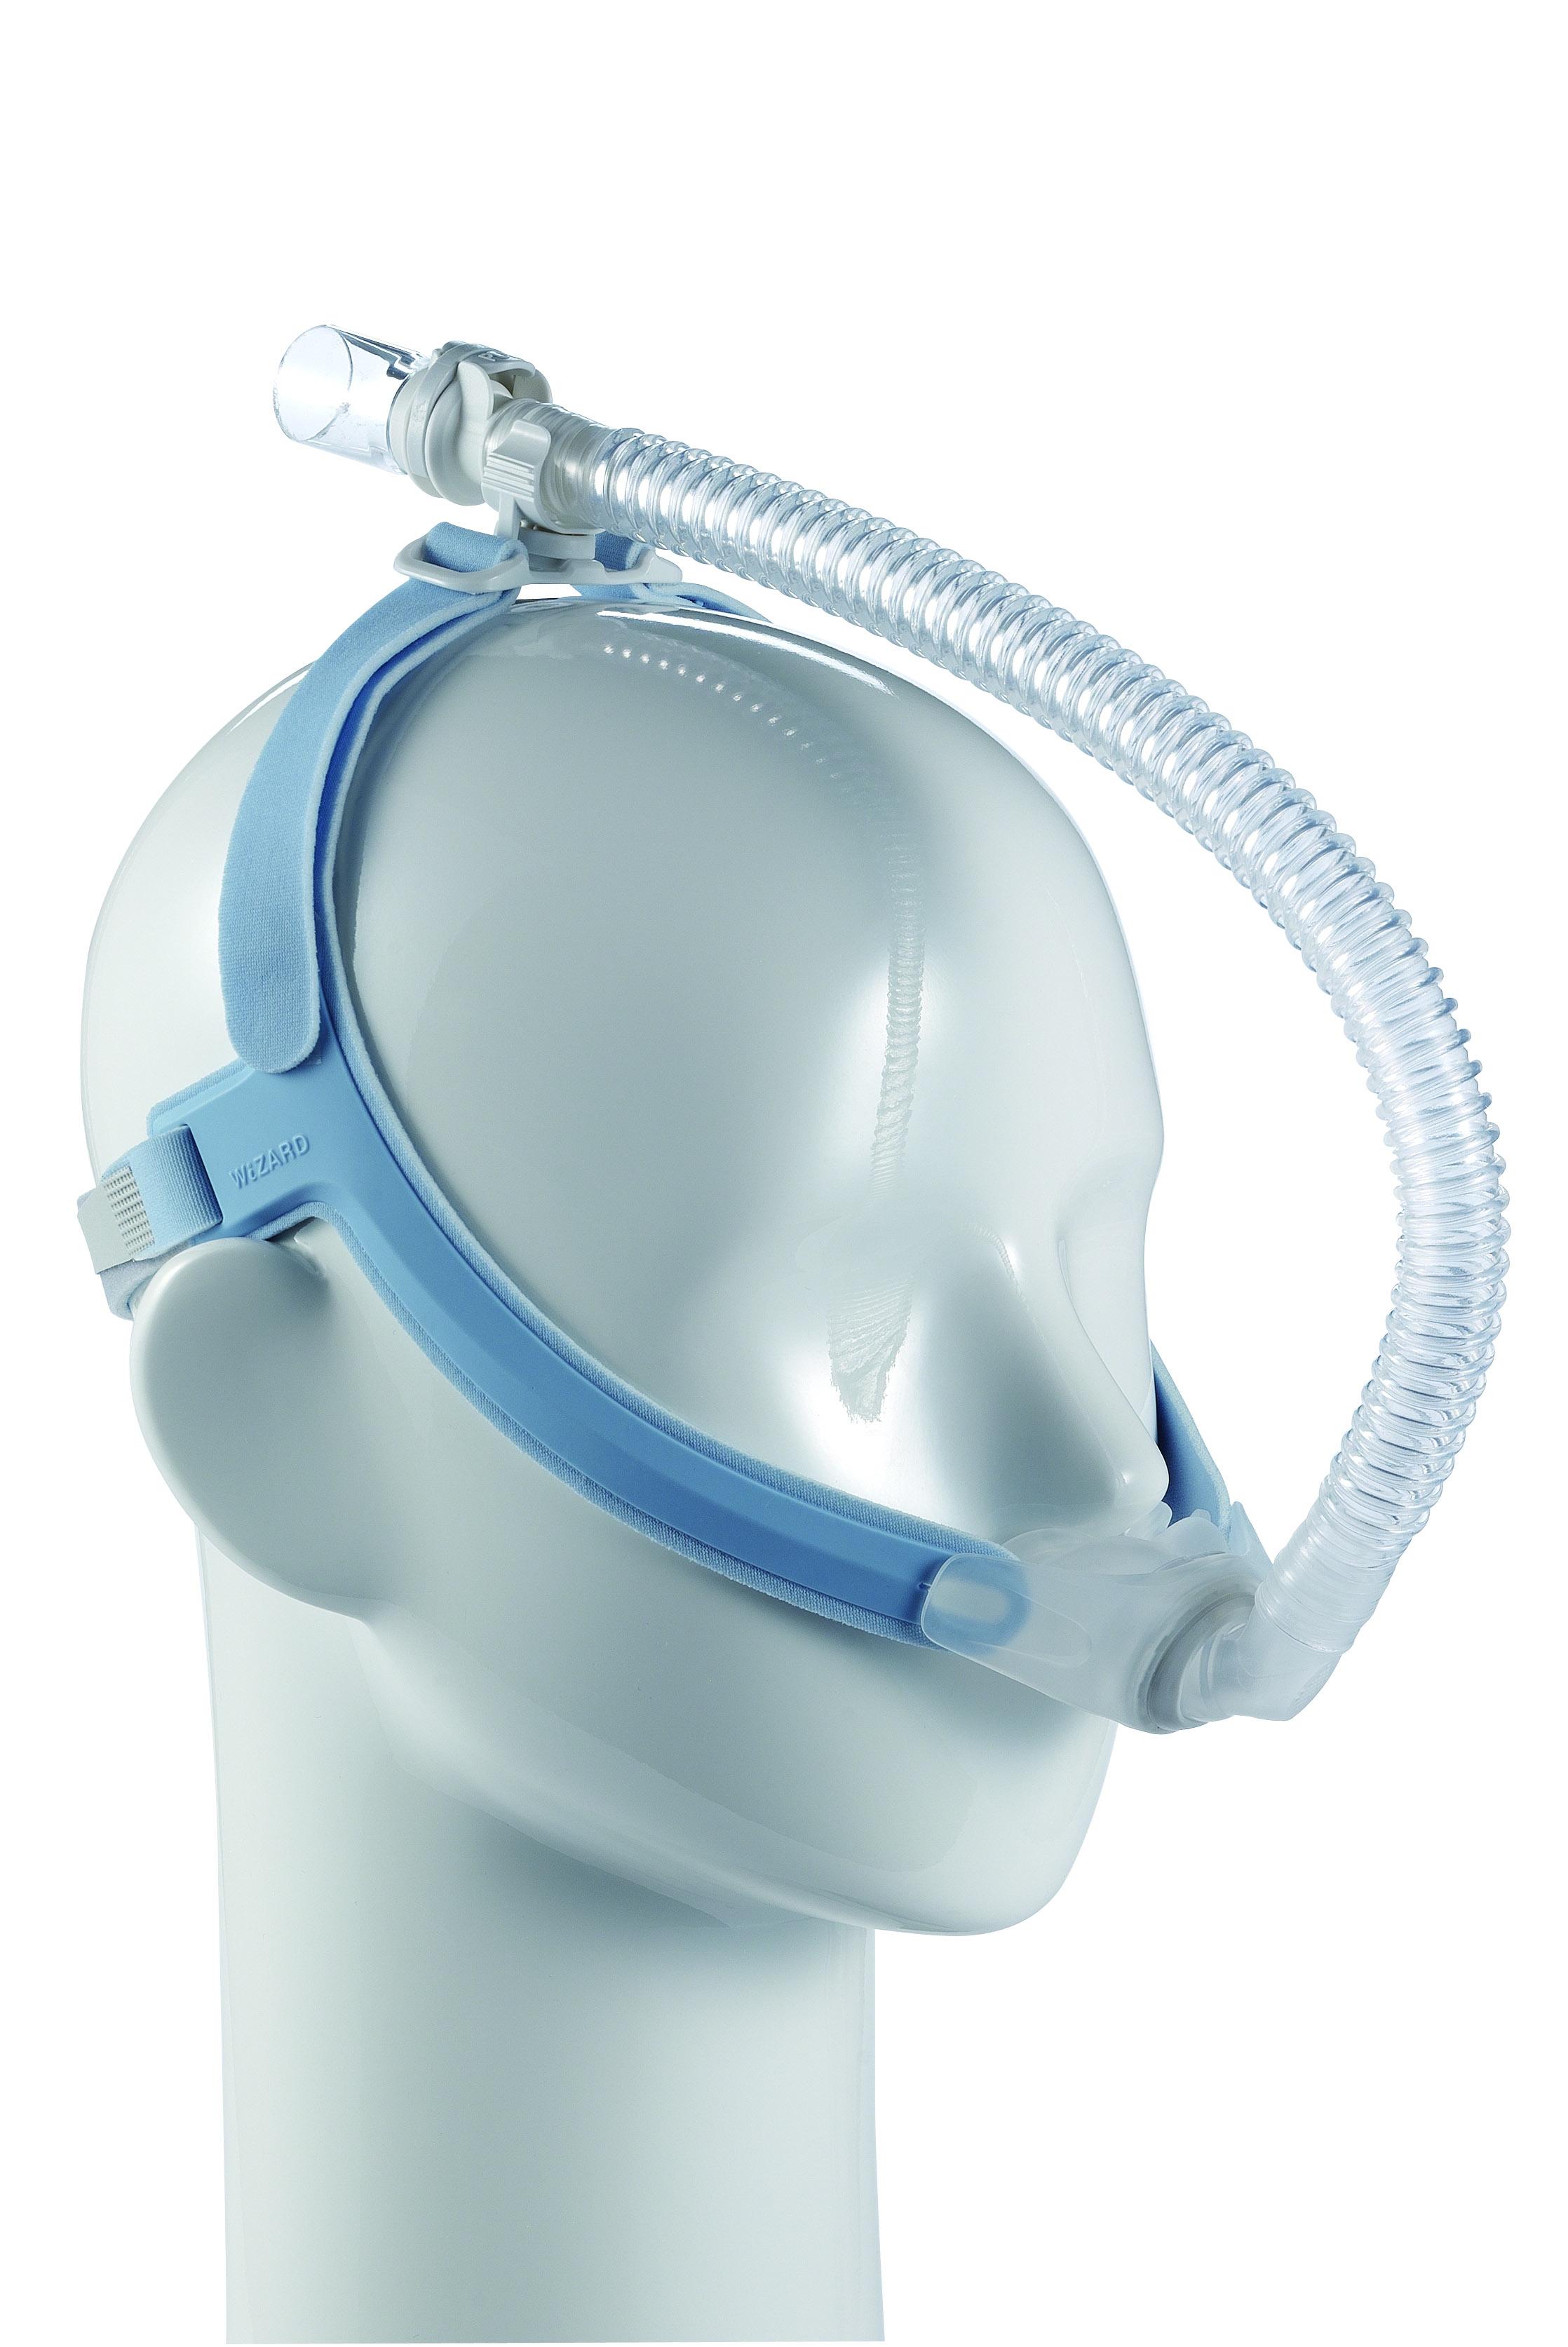 WiZARD 230 Nasal Pillows Mask